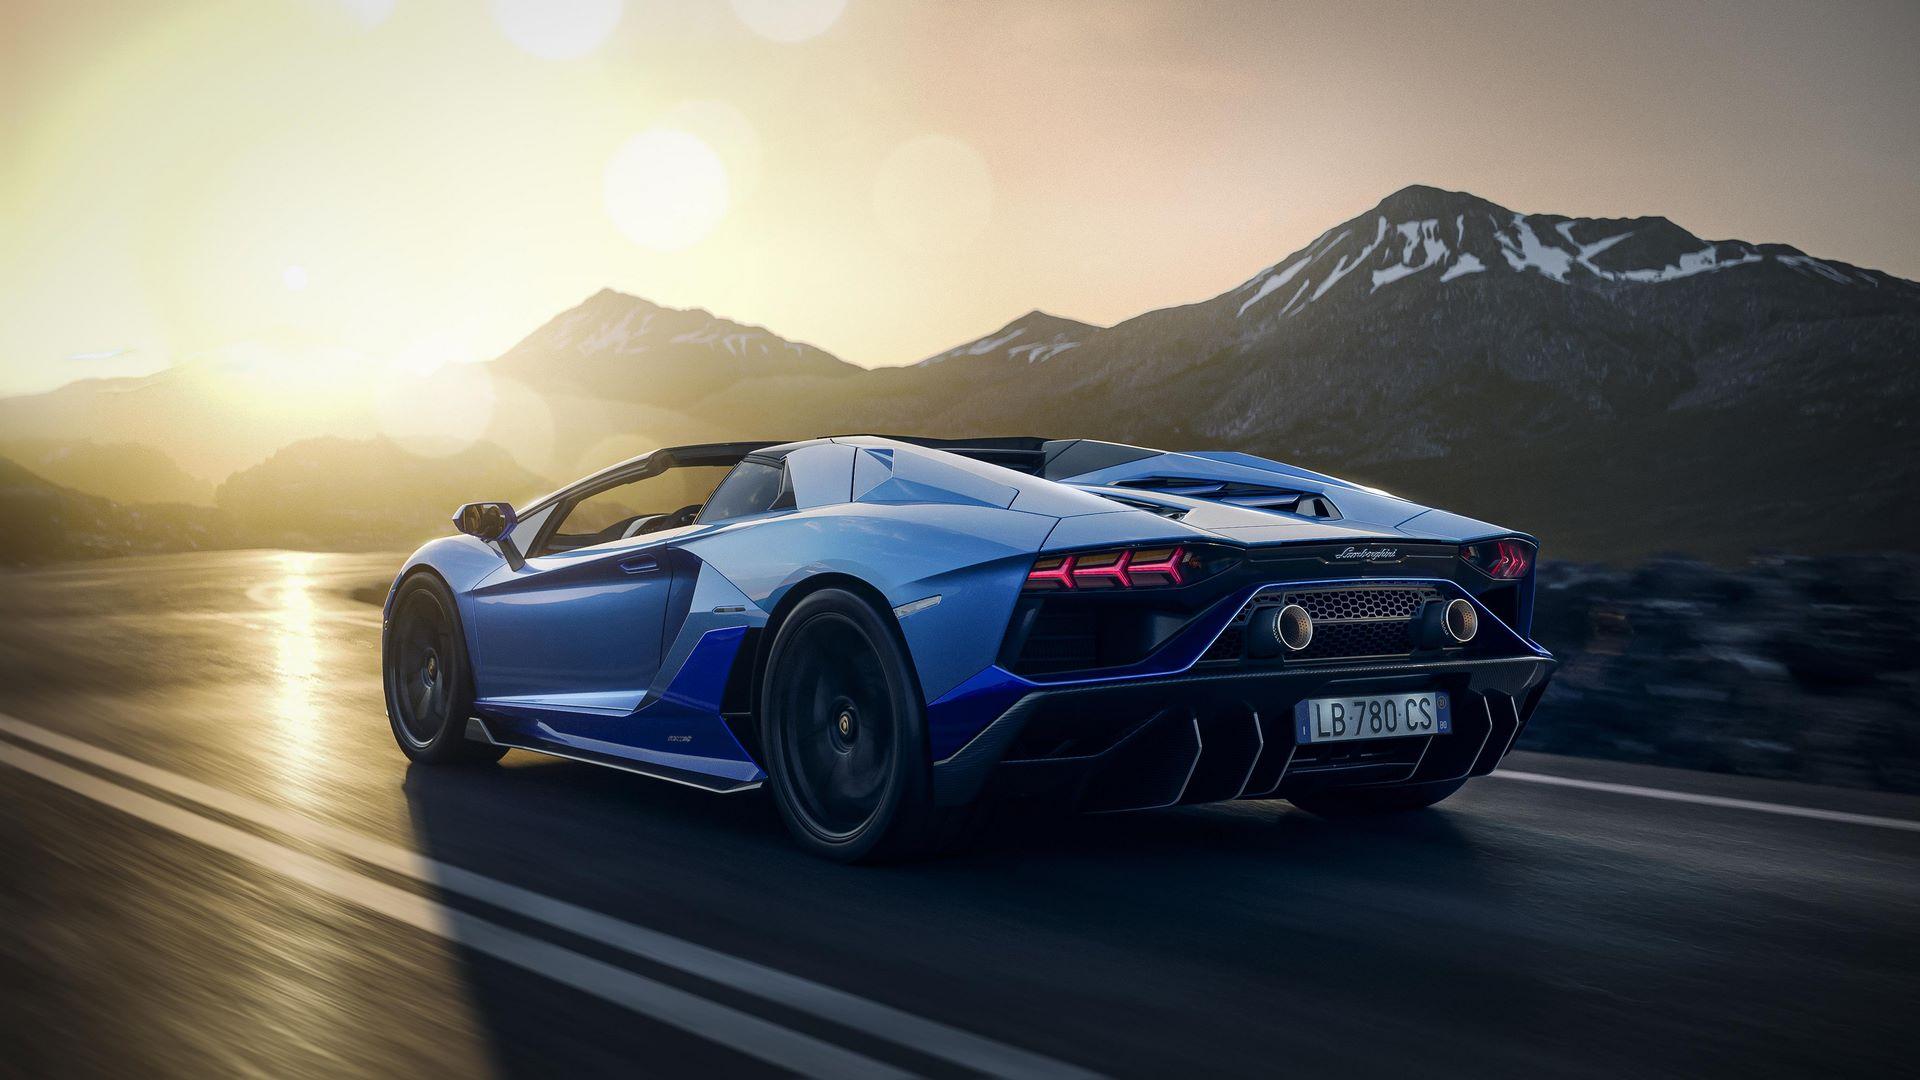 Lamborghini-Aventador-LP780-4-Ultimae-19